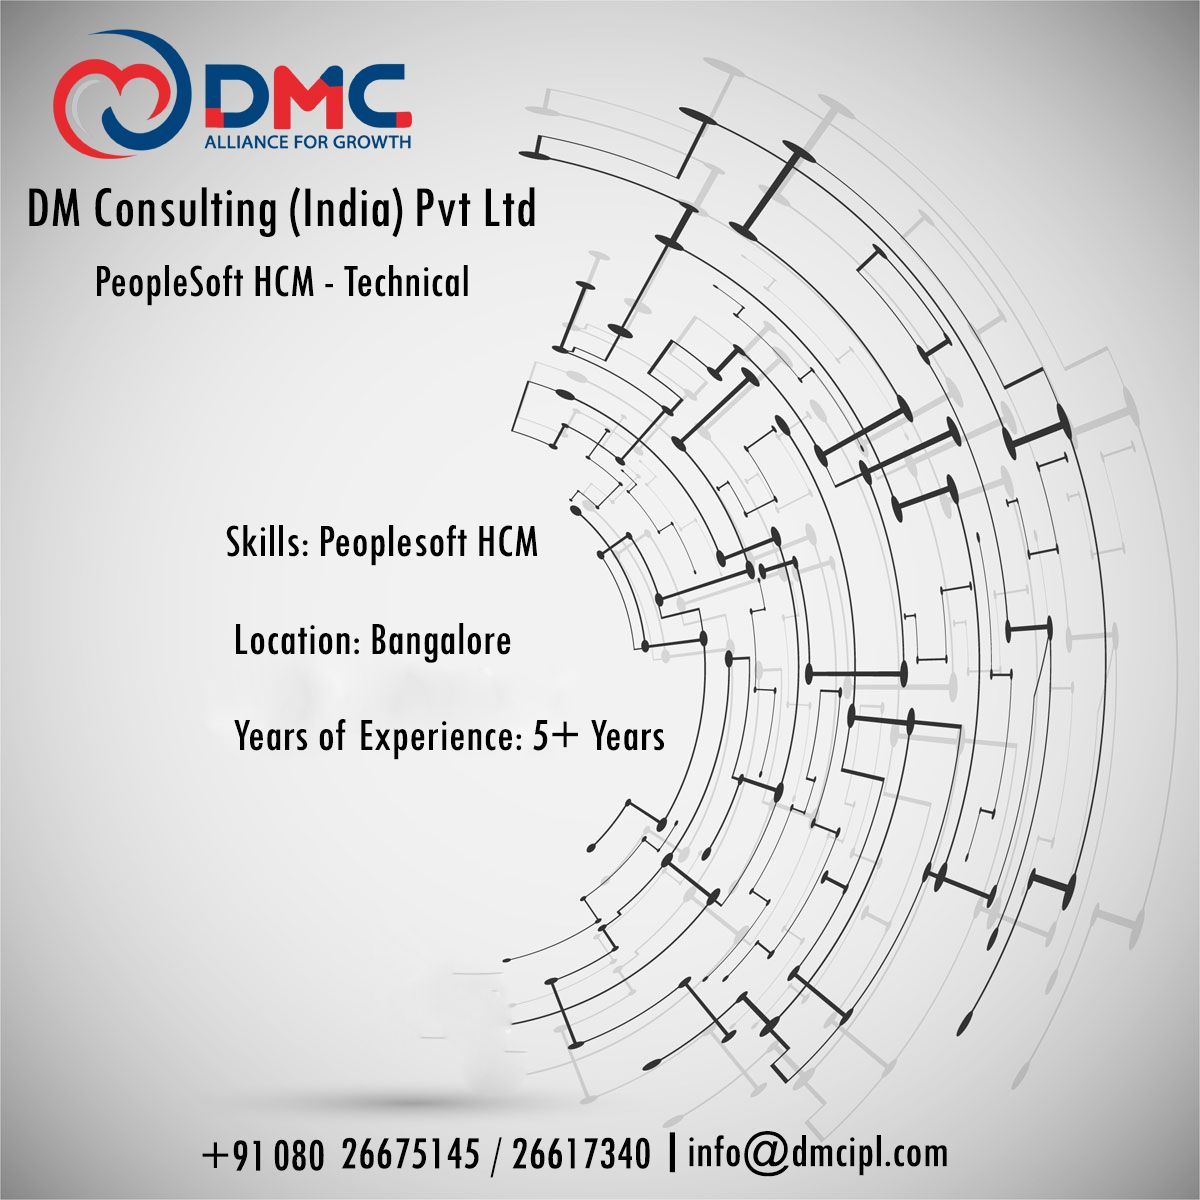 Pin by DM Consulting on Job Posting Job posting